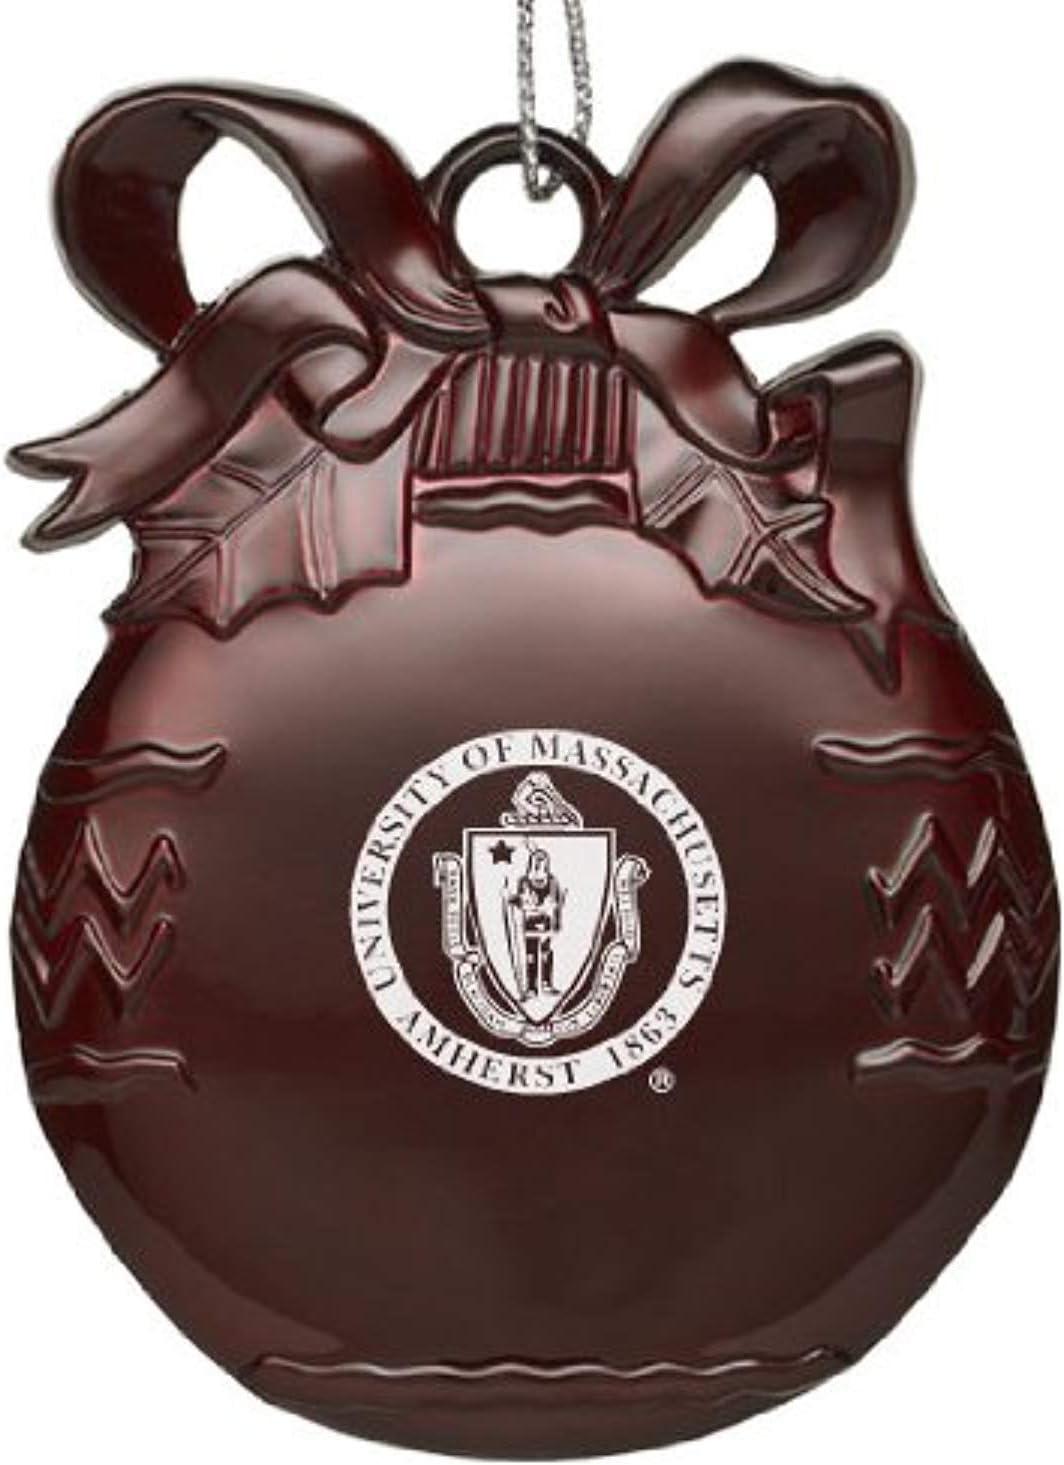 LXG University of Massachusetts - Amherst - Pewter Christmas Tree Ornament - Burgundy